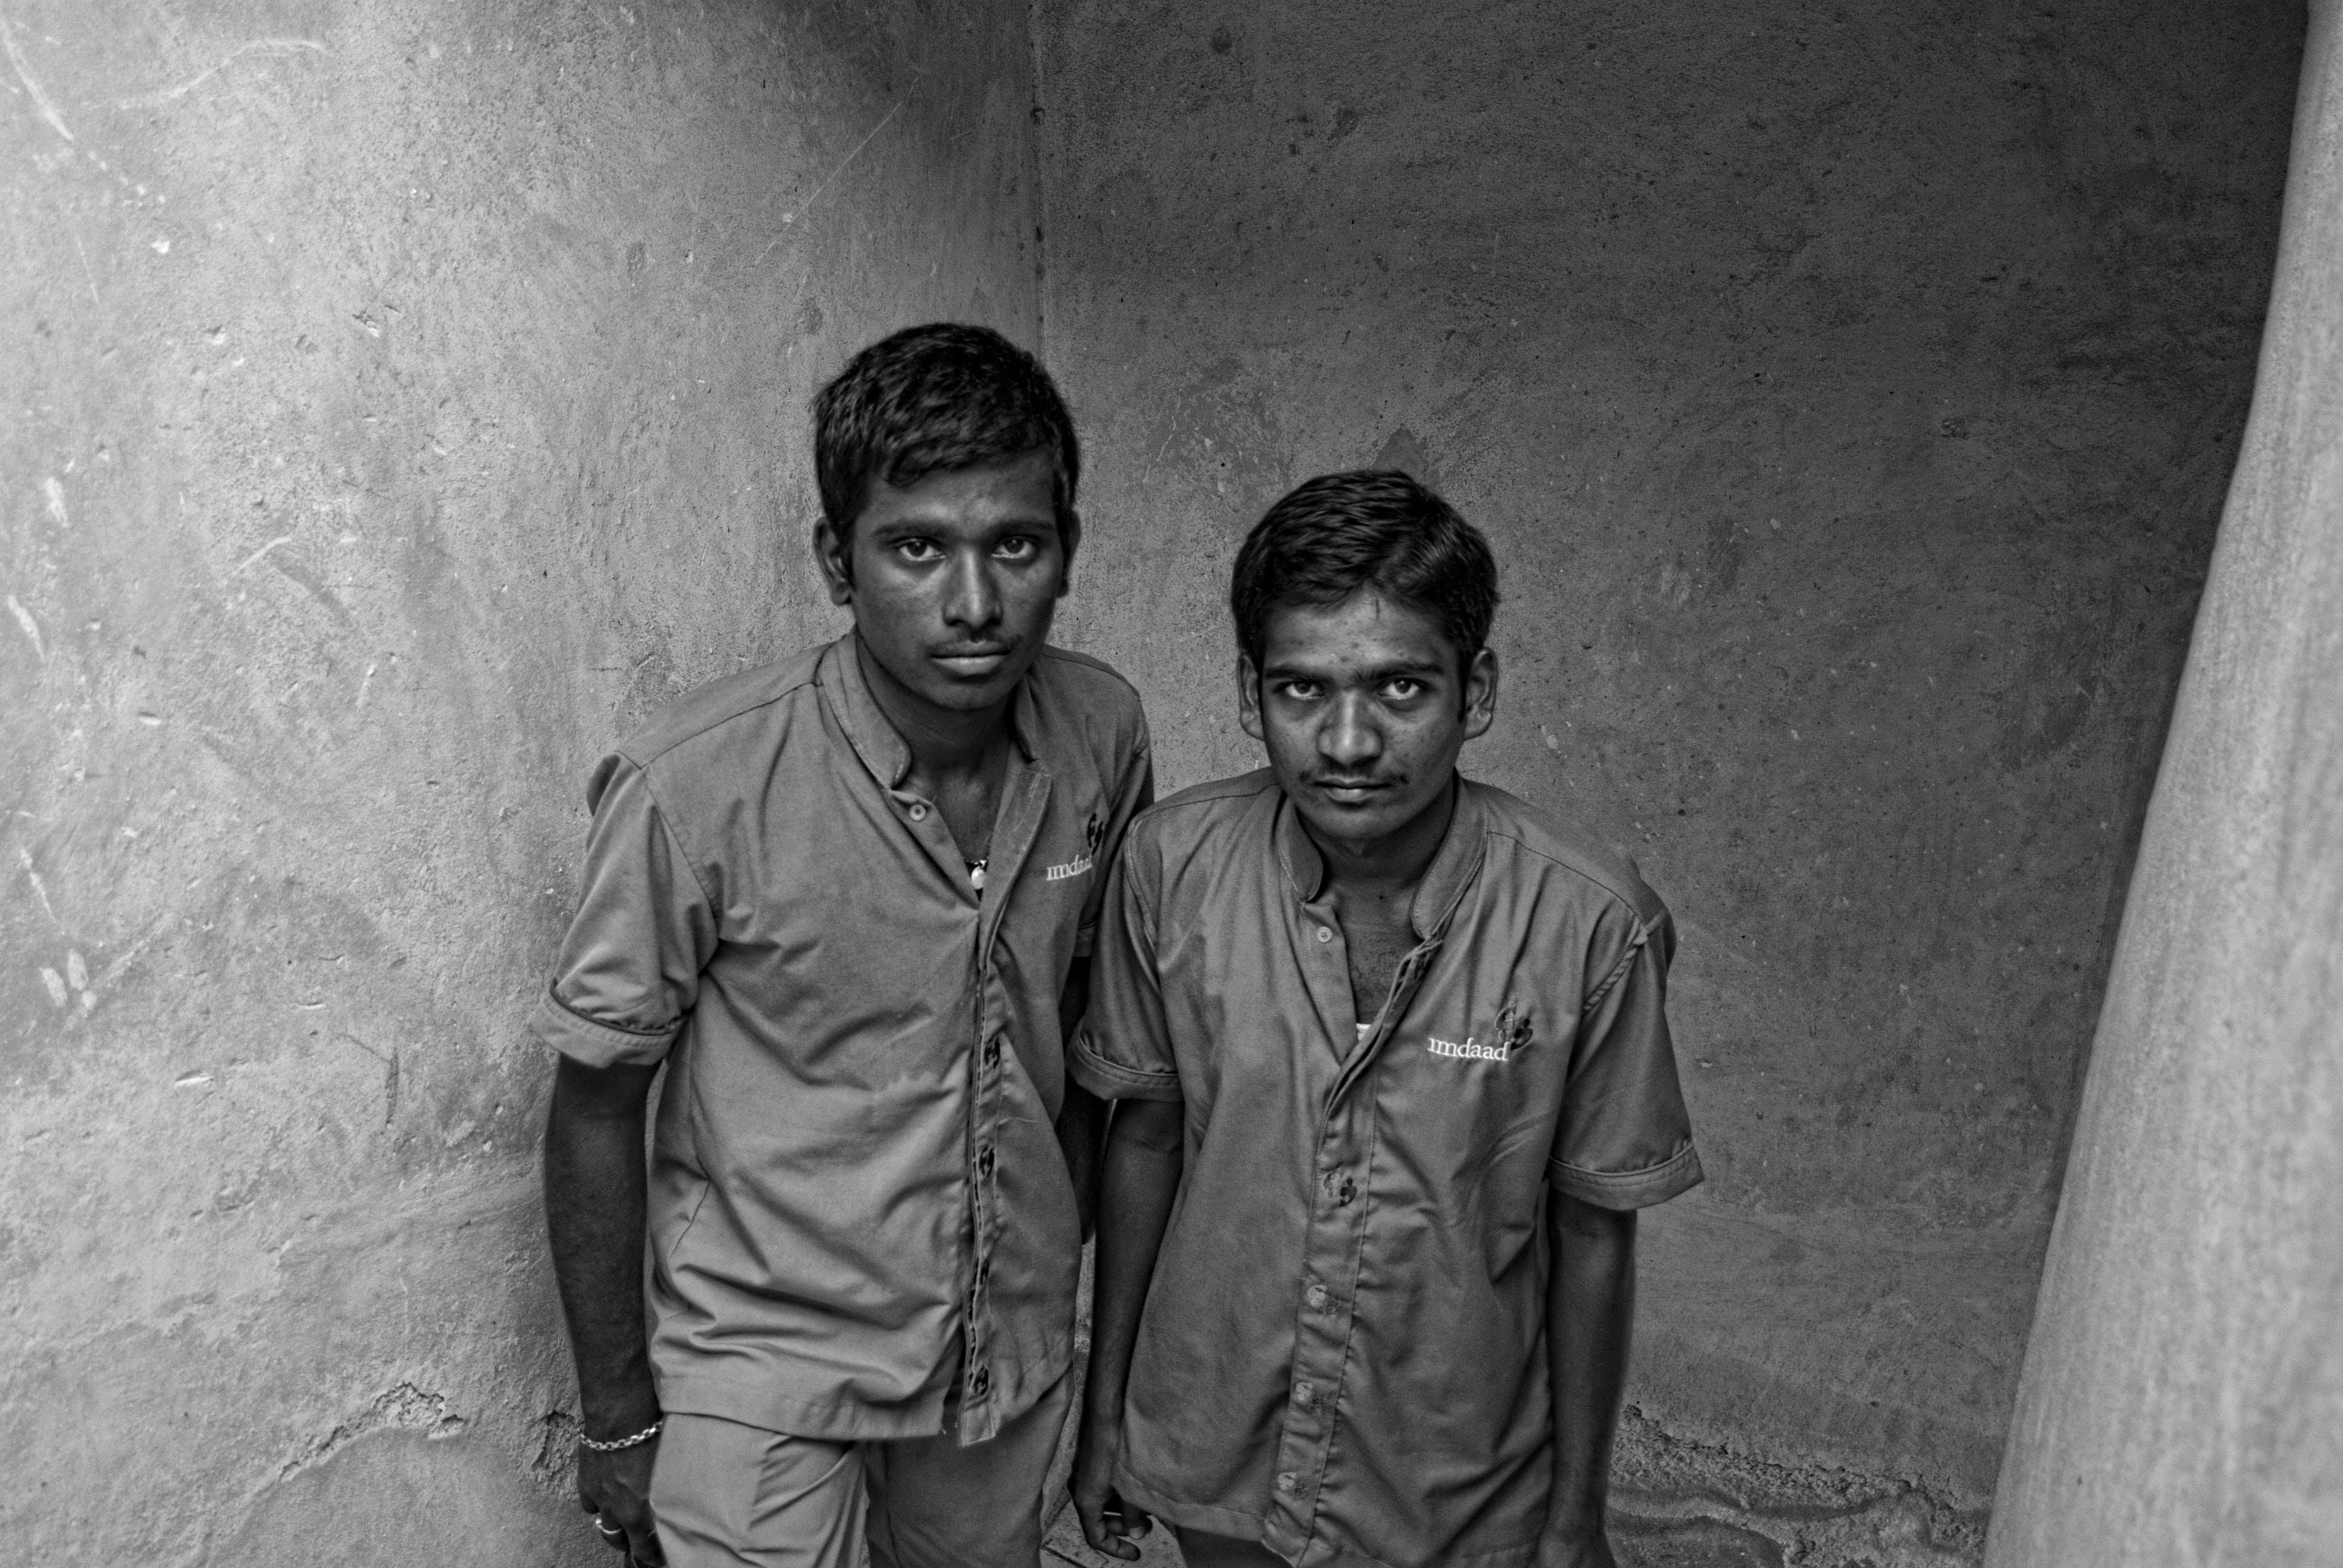 of #black&white #urbanwall #portrait